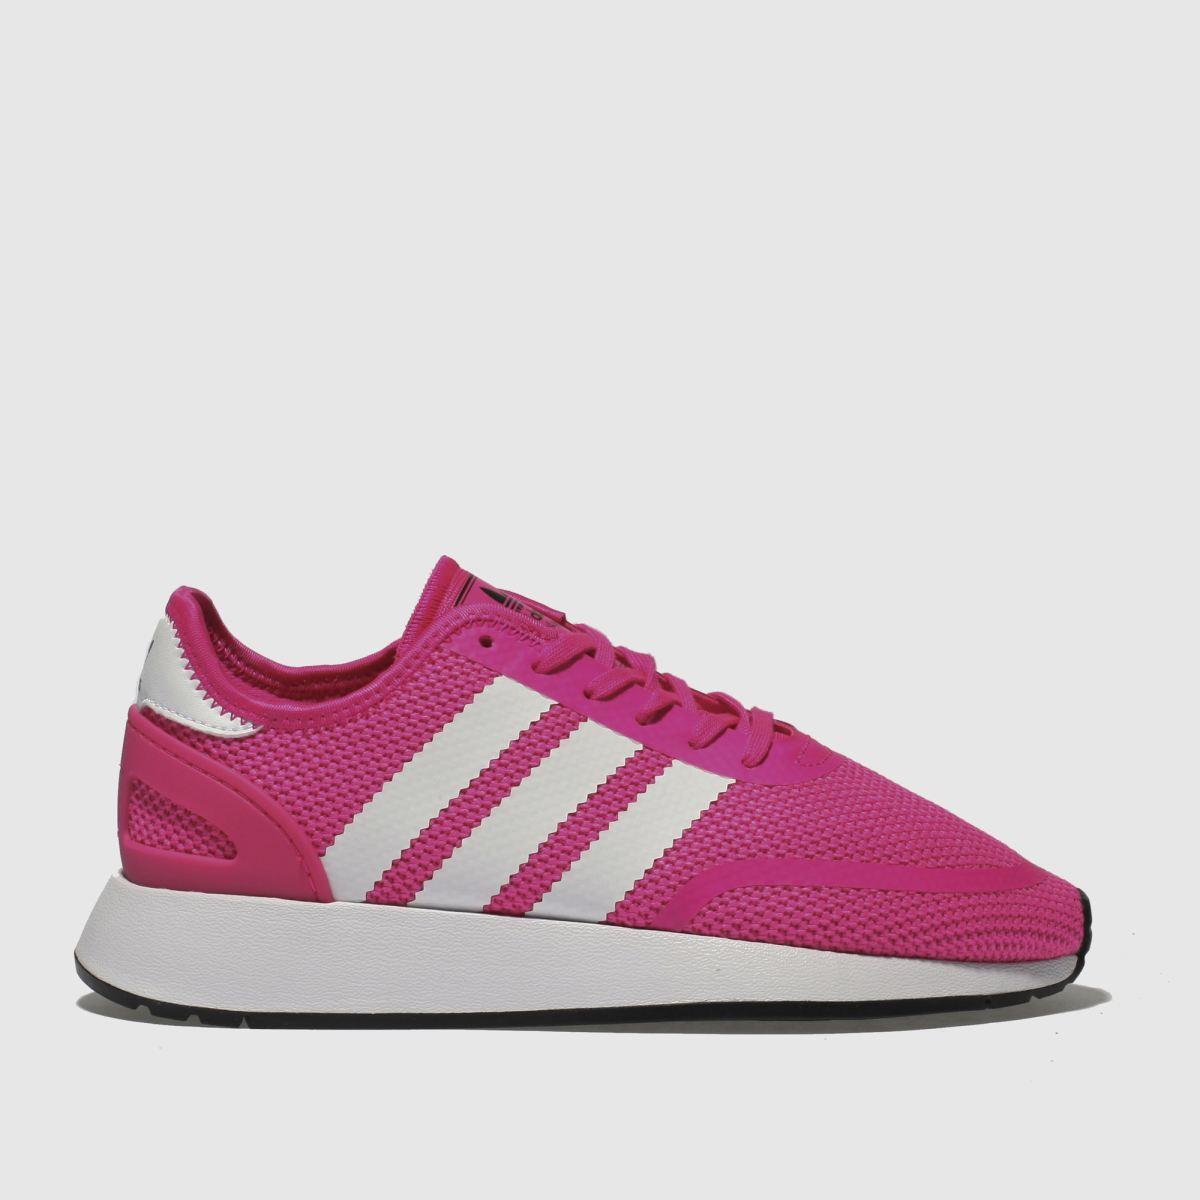 Adidas Pink N-5923 Girls Youth Youth